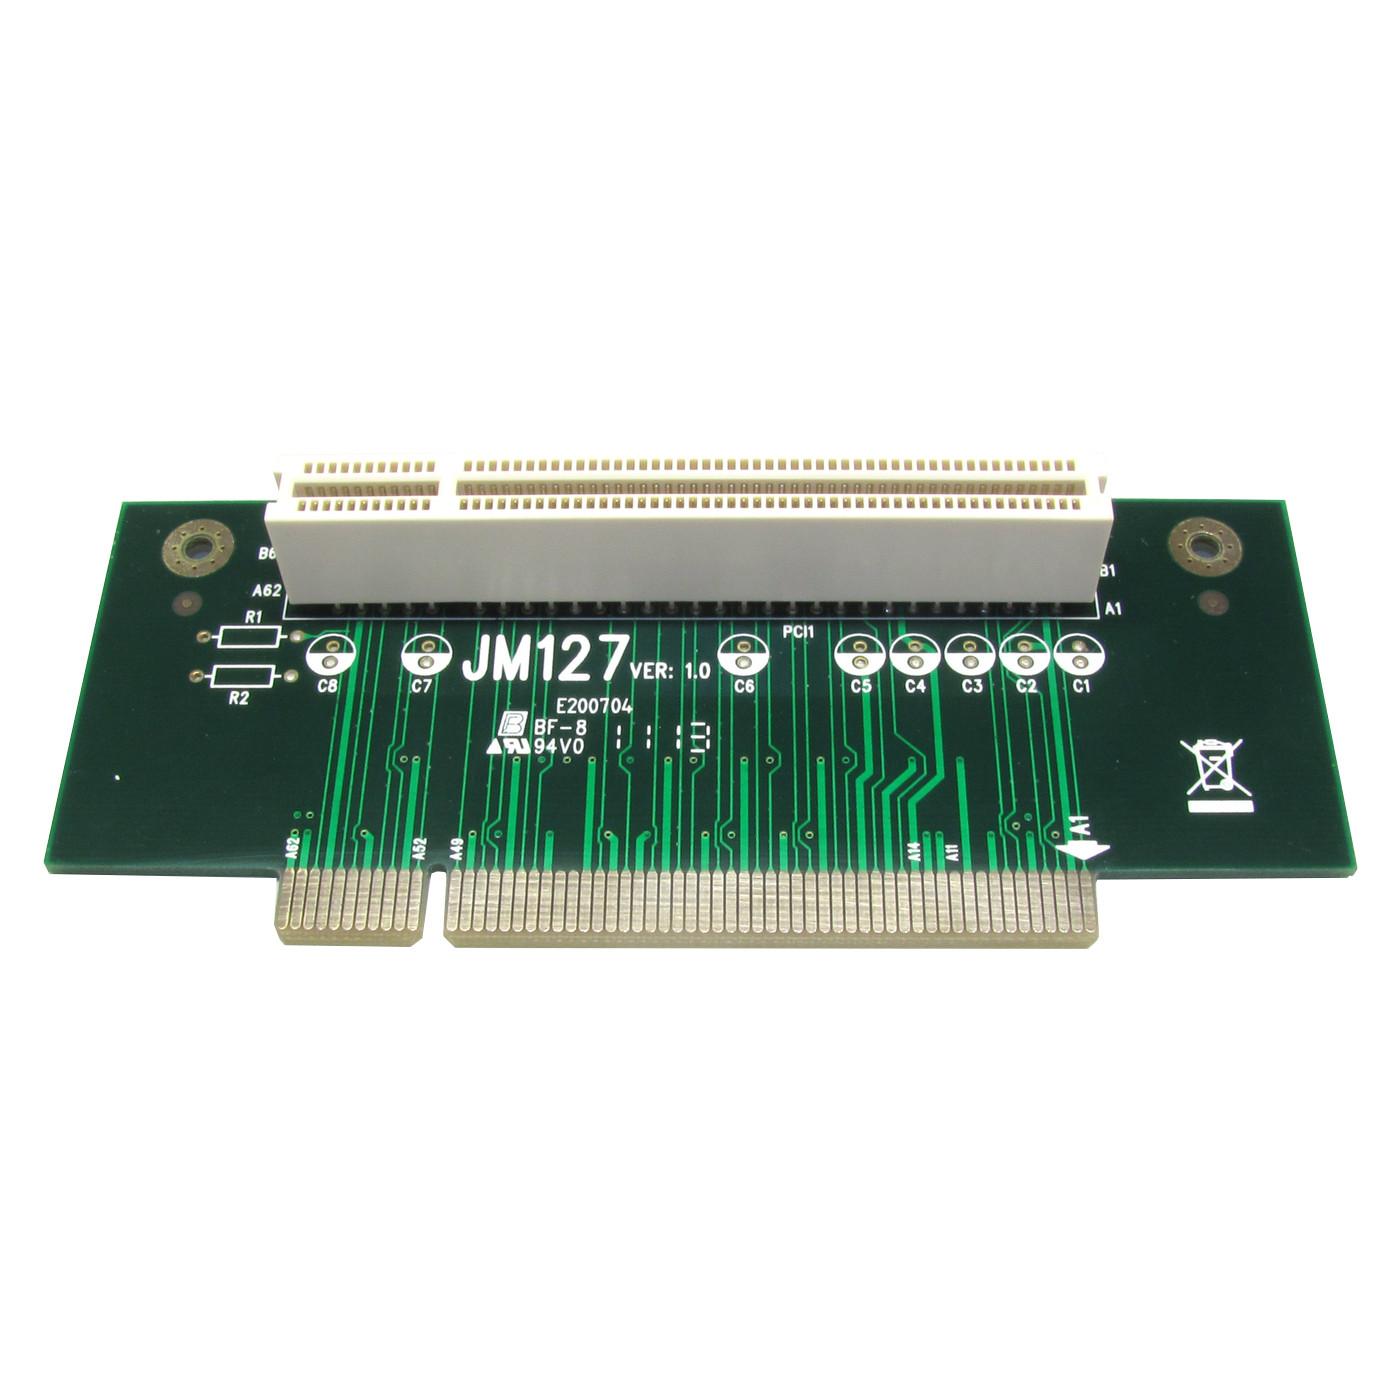 Riser Card JM-127  1-1 PCI pro EM-141,153,111,121